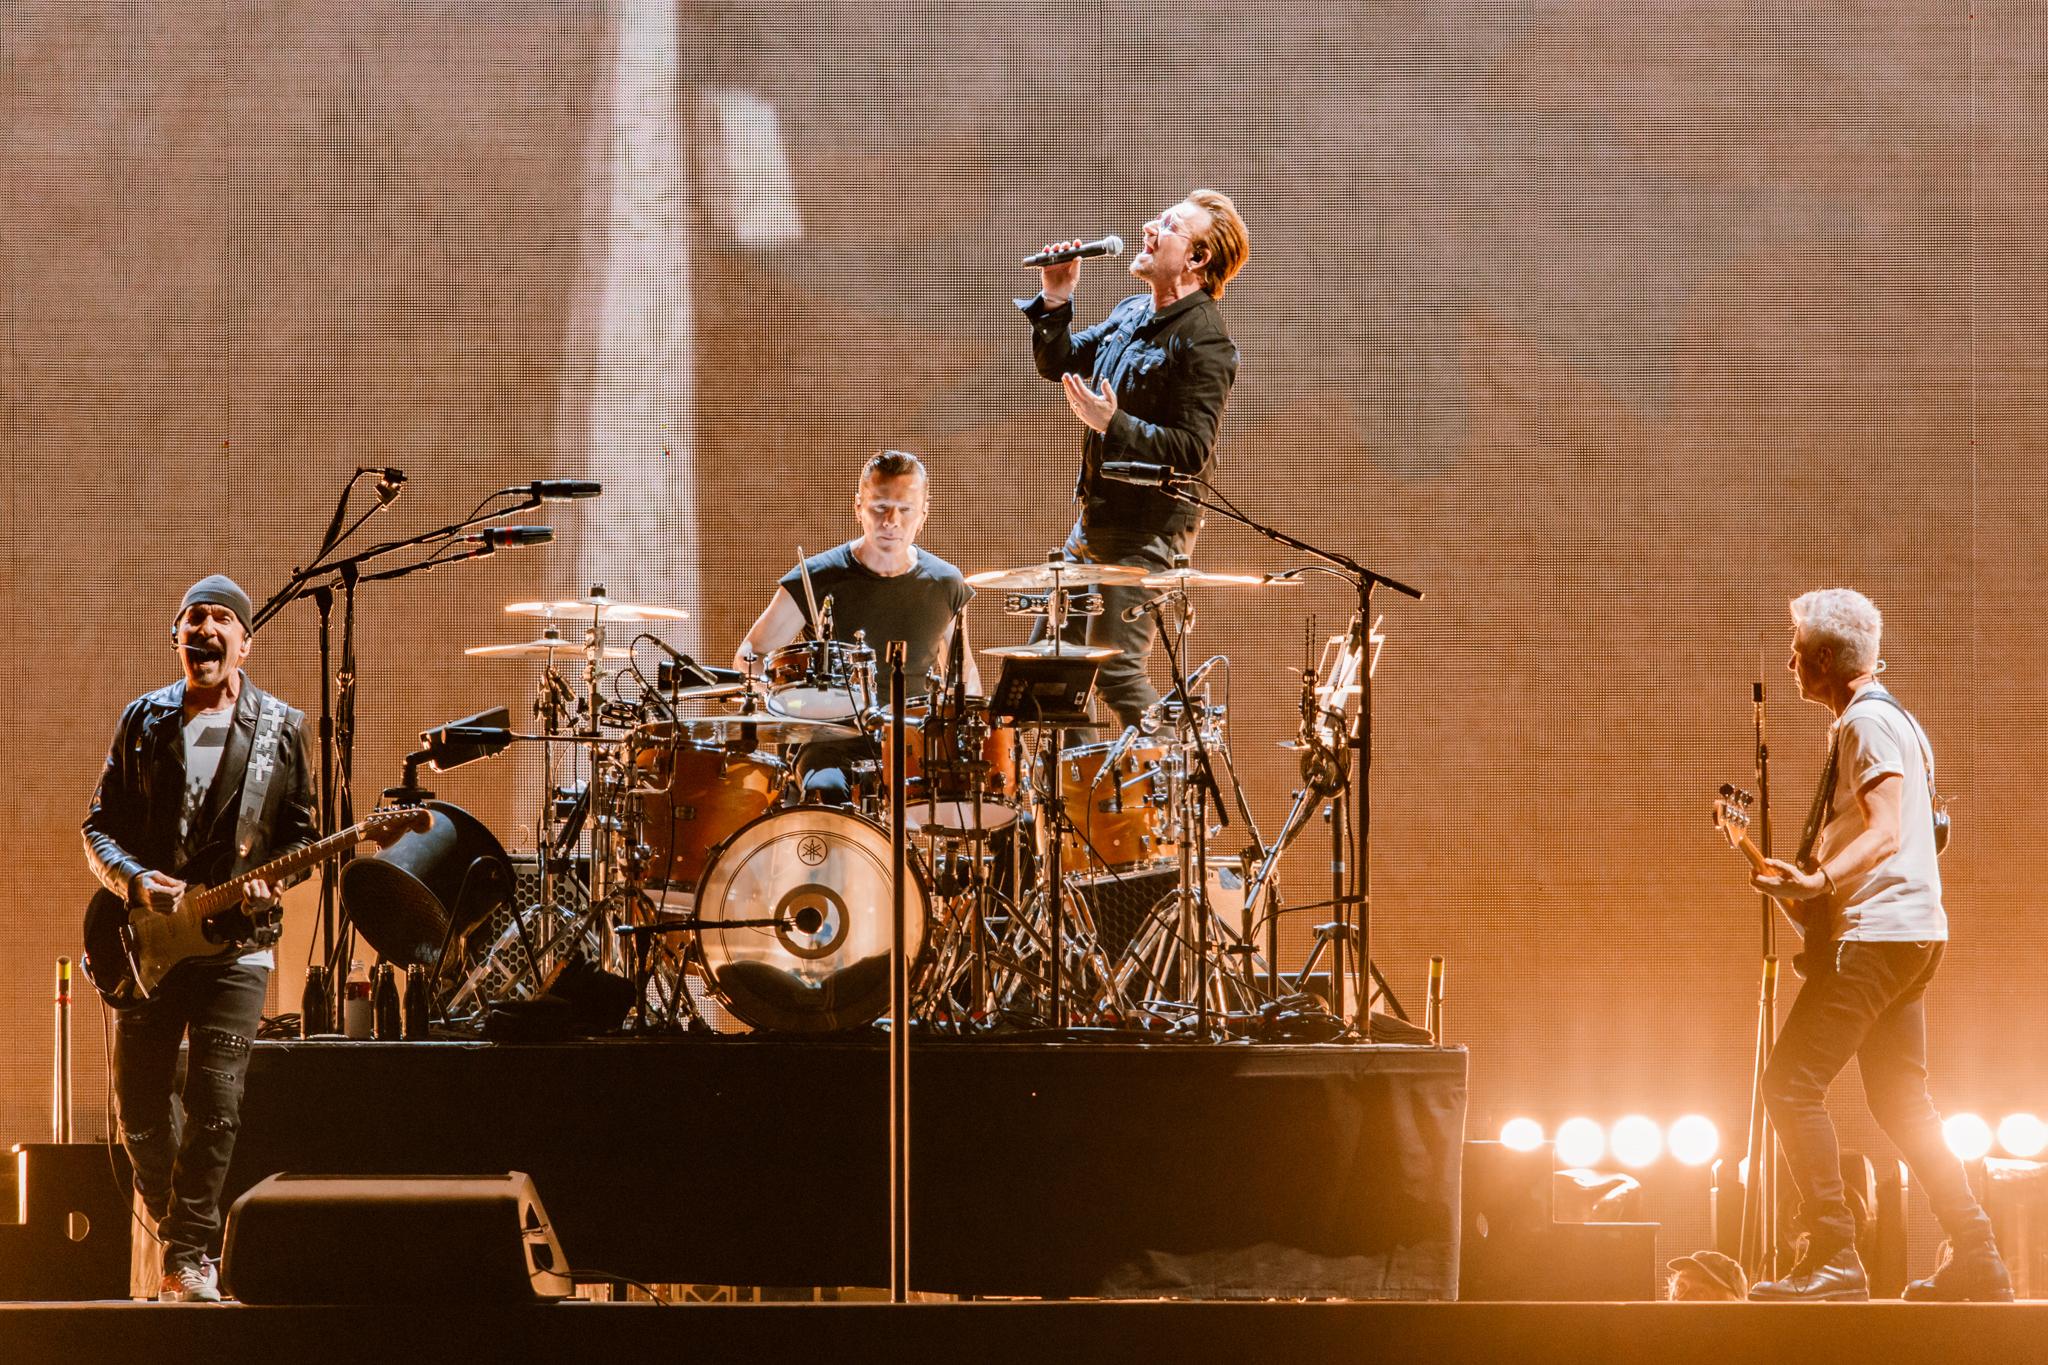 U2 performing at FedExField in Landover, MD - 6/20/2017 (photo by Matt Condon / @arcane93)